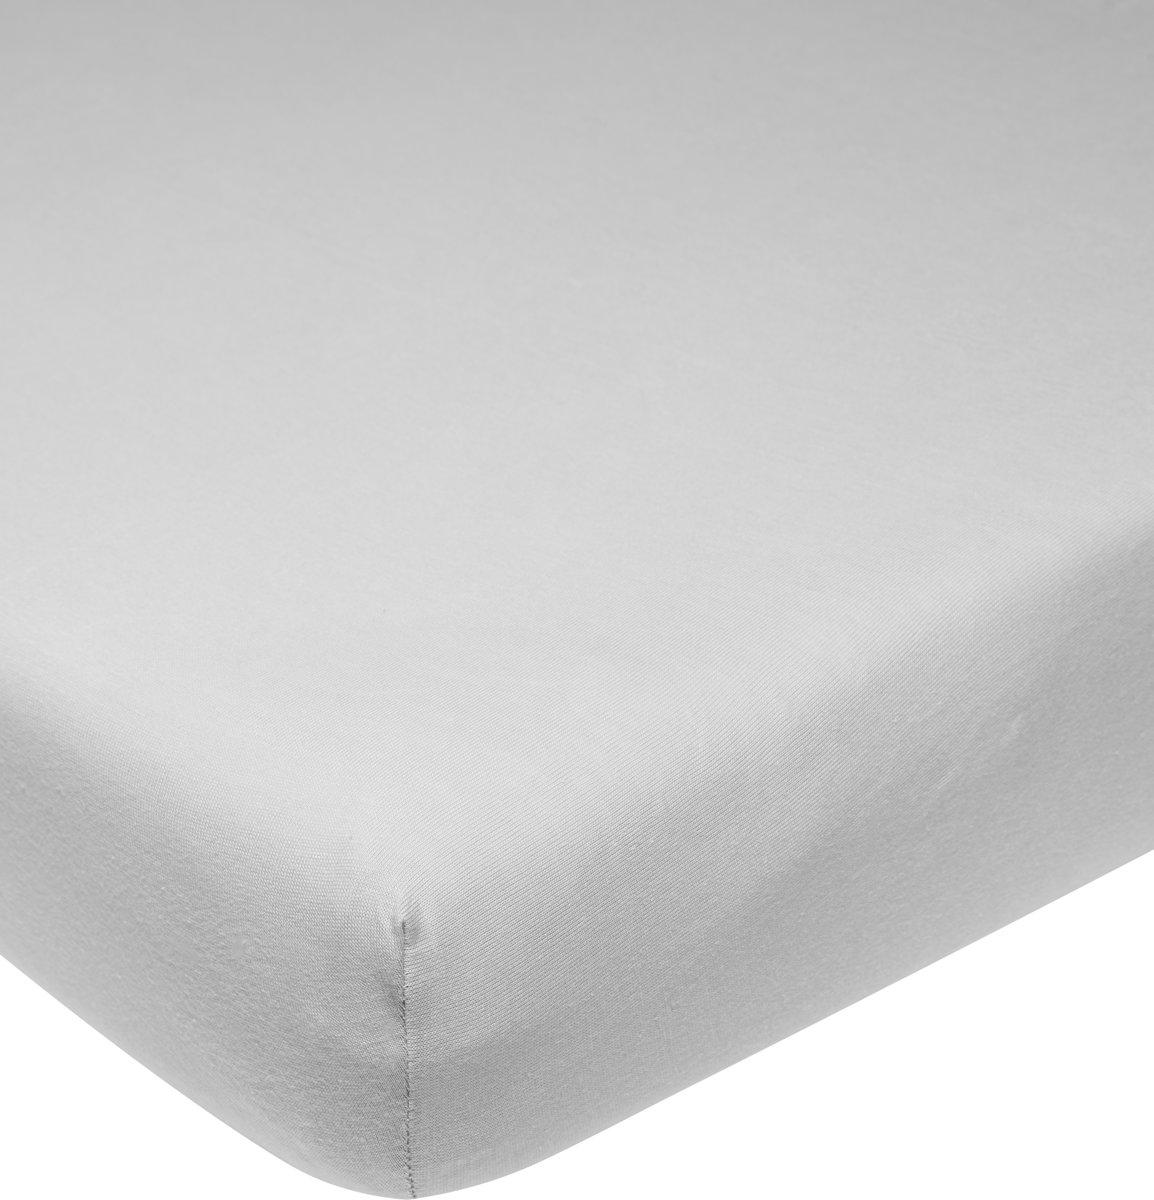 Meyco jersey hoeslaken - 60x120 cm - lichtgrijs